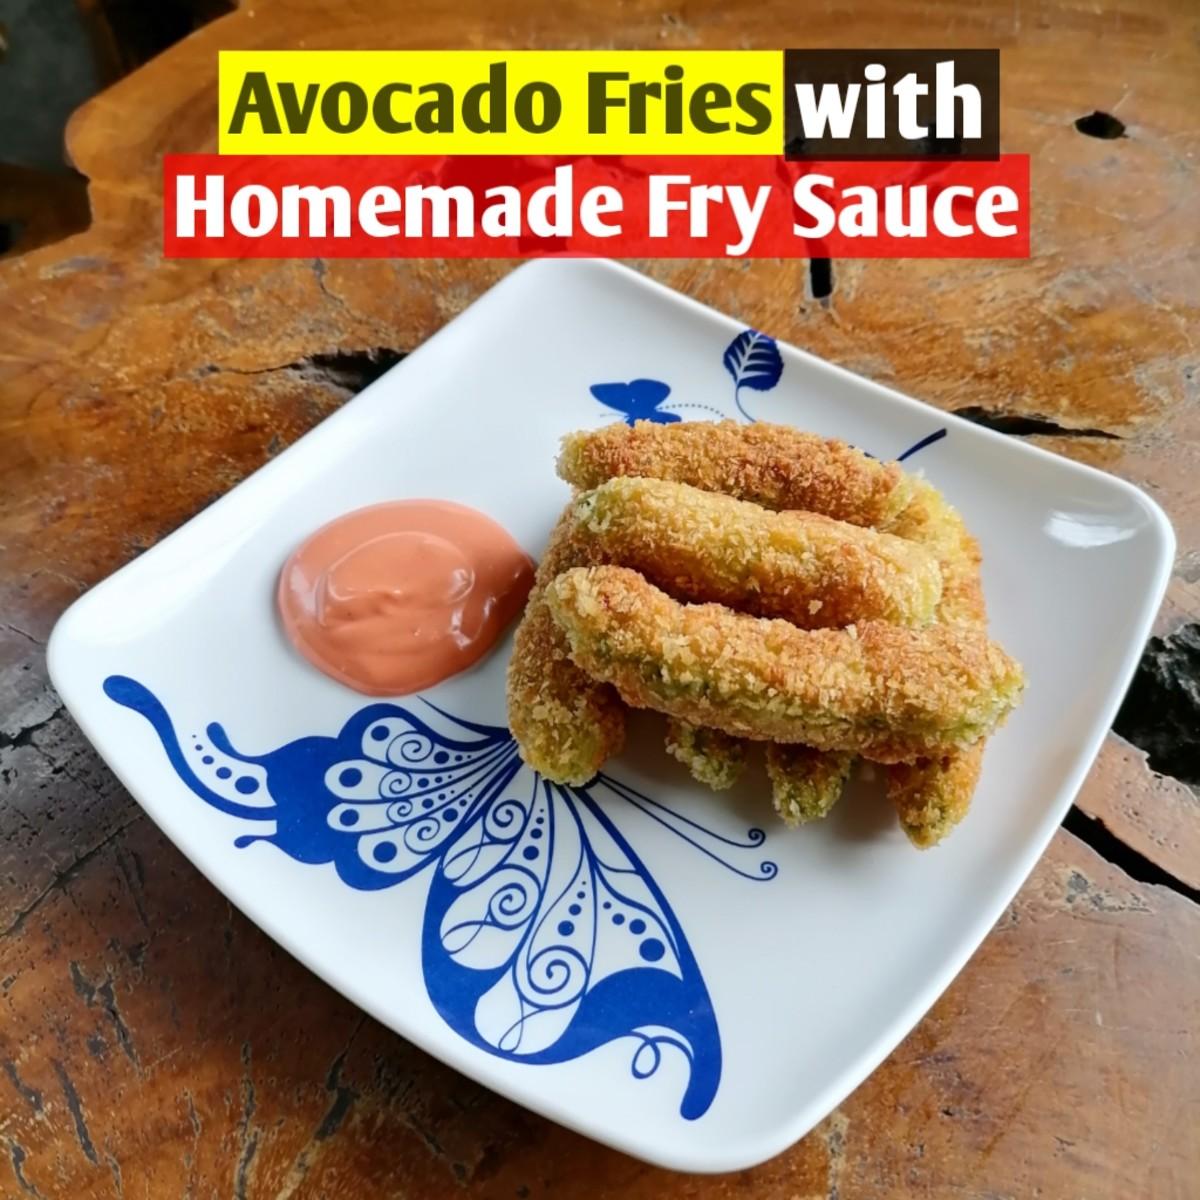 Avocado fries with homemade fry sauce